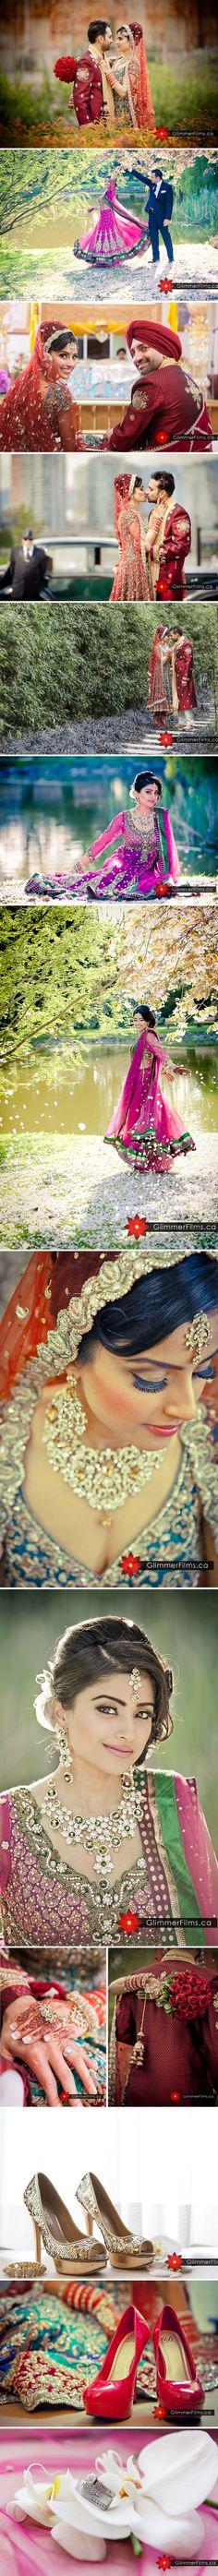 Indian wedding photography. Couple photo shoot ideas. http://tinyurl.com/pkm7khr